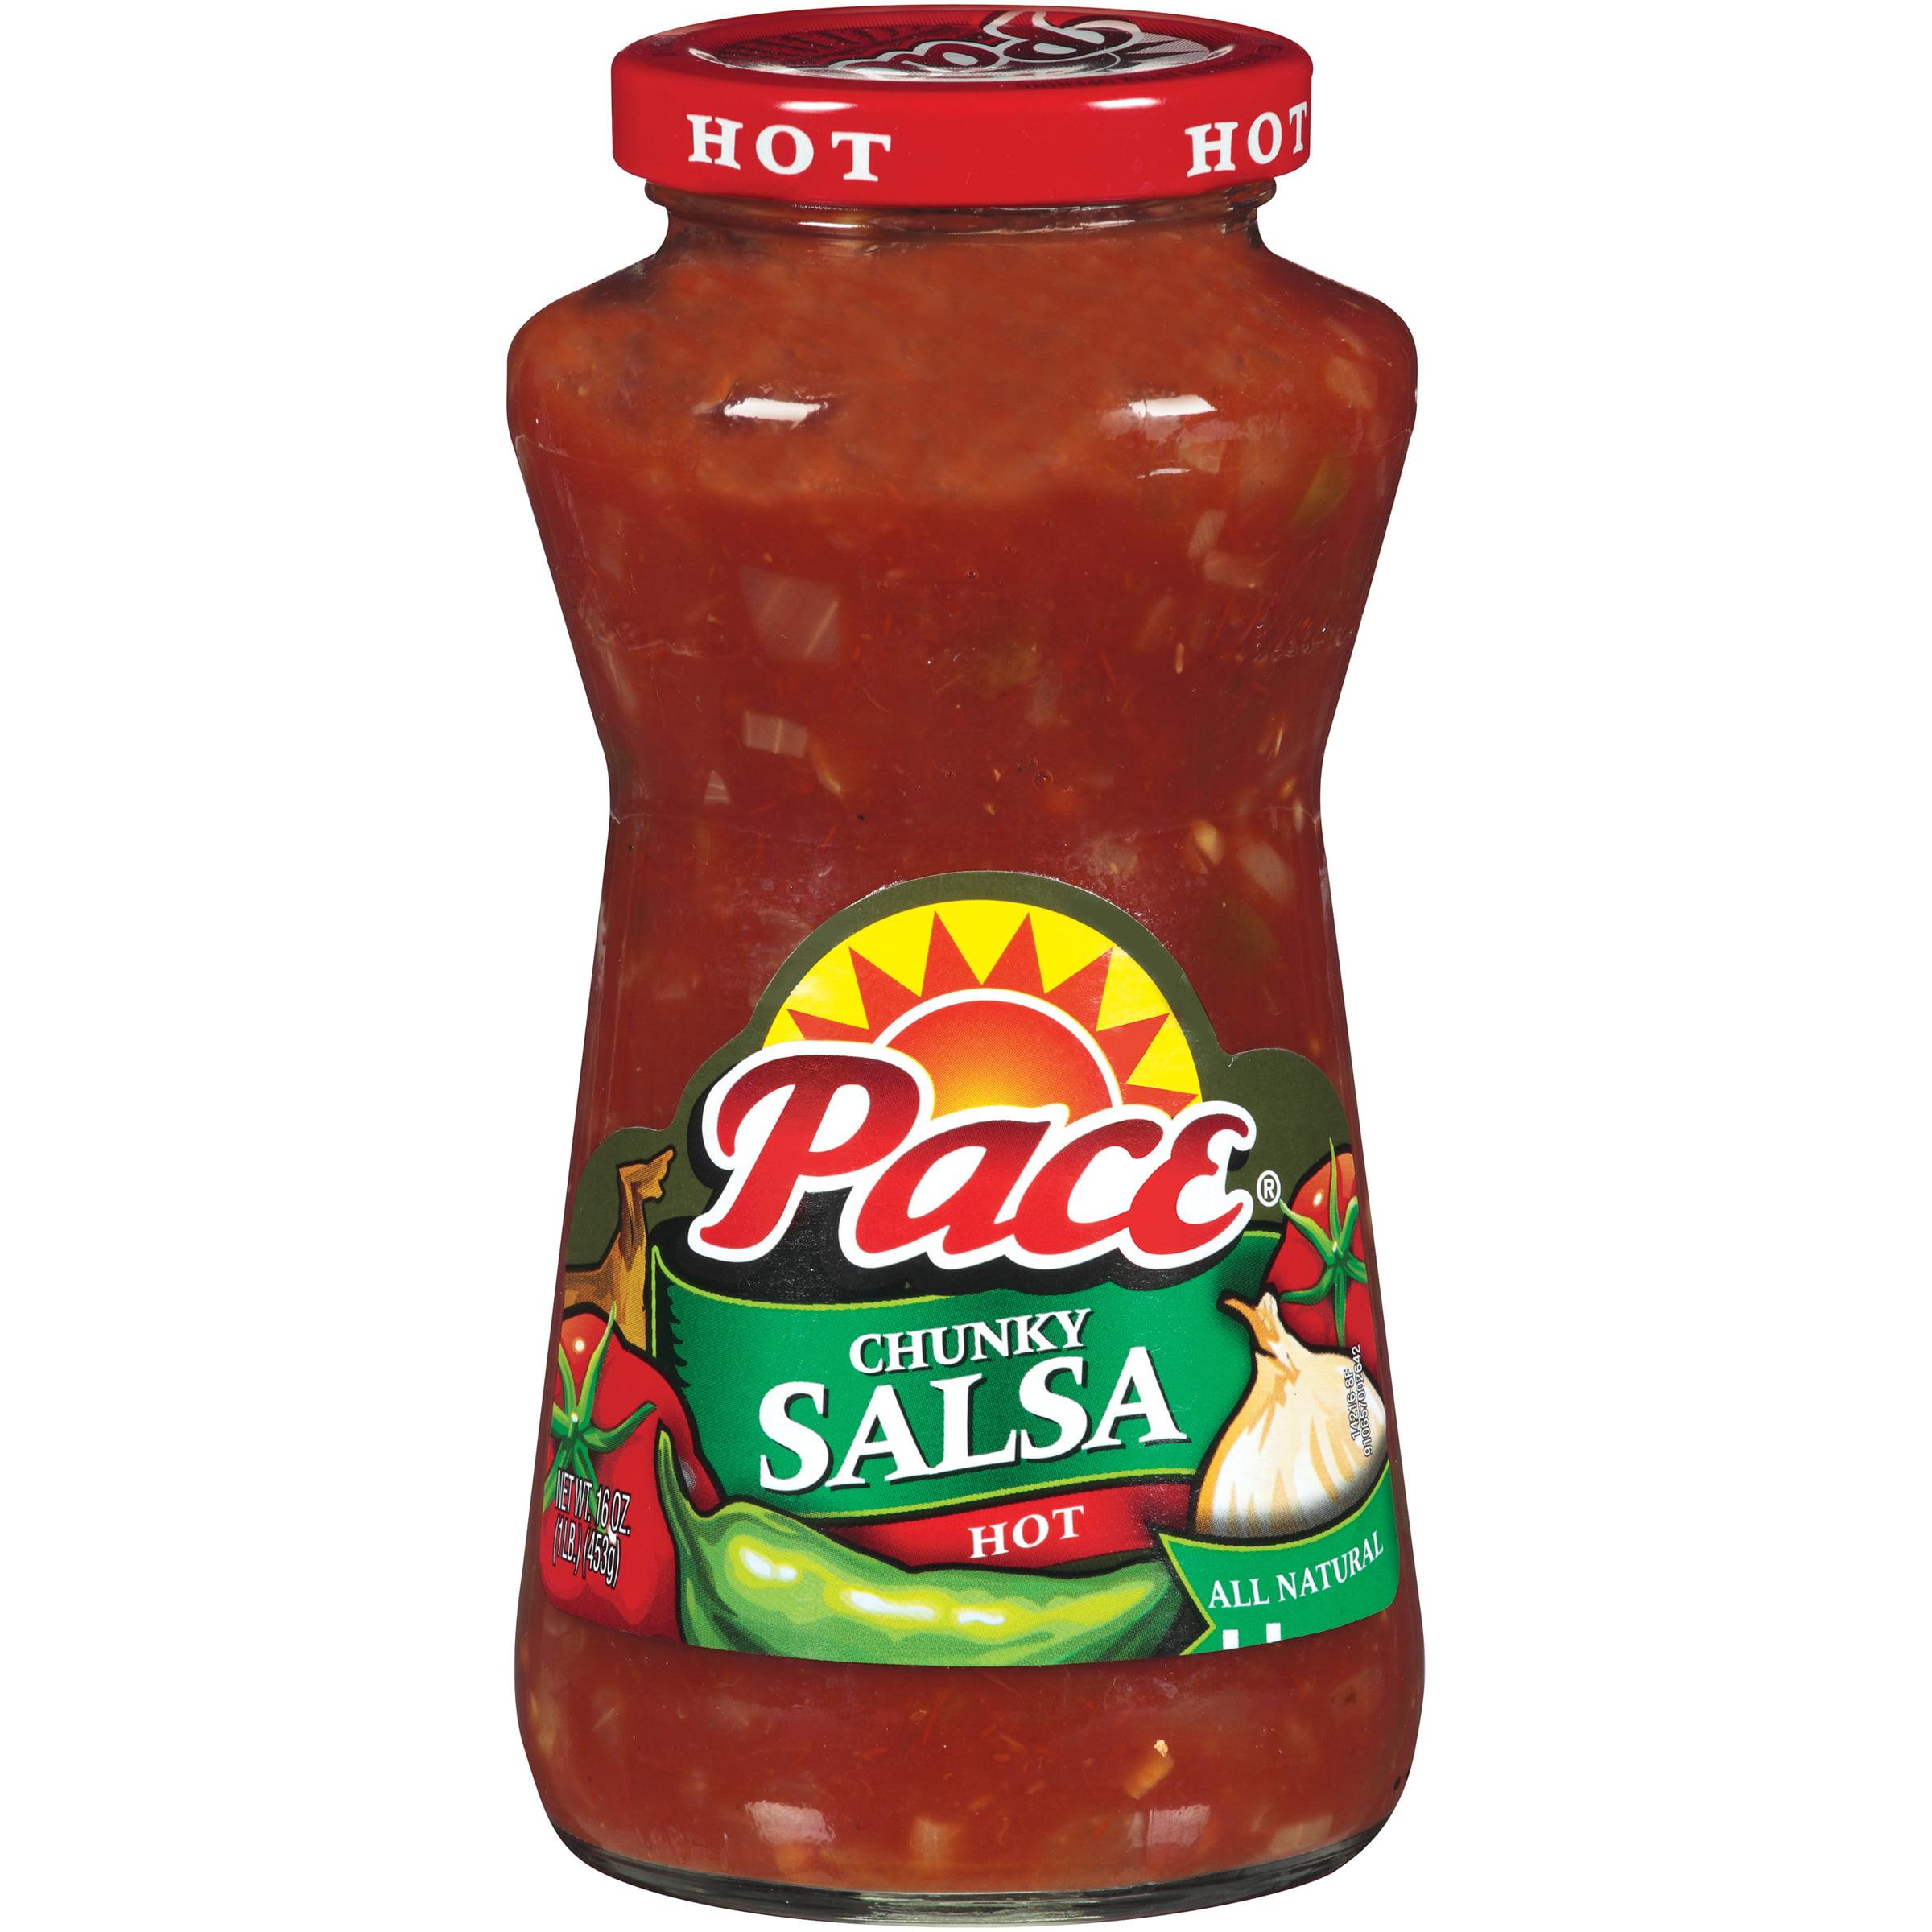 Pace Hot Chunky Salsa 16oz